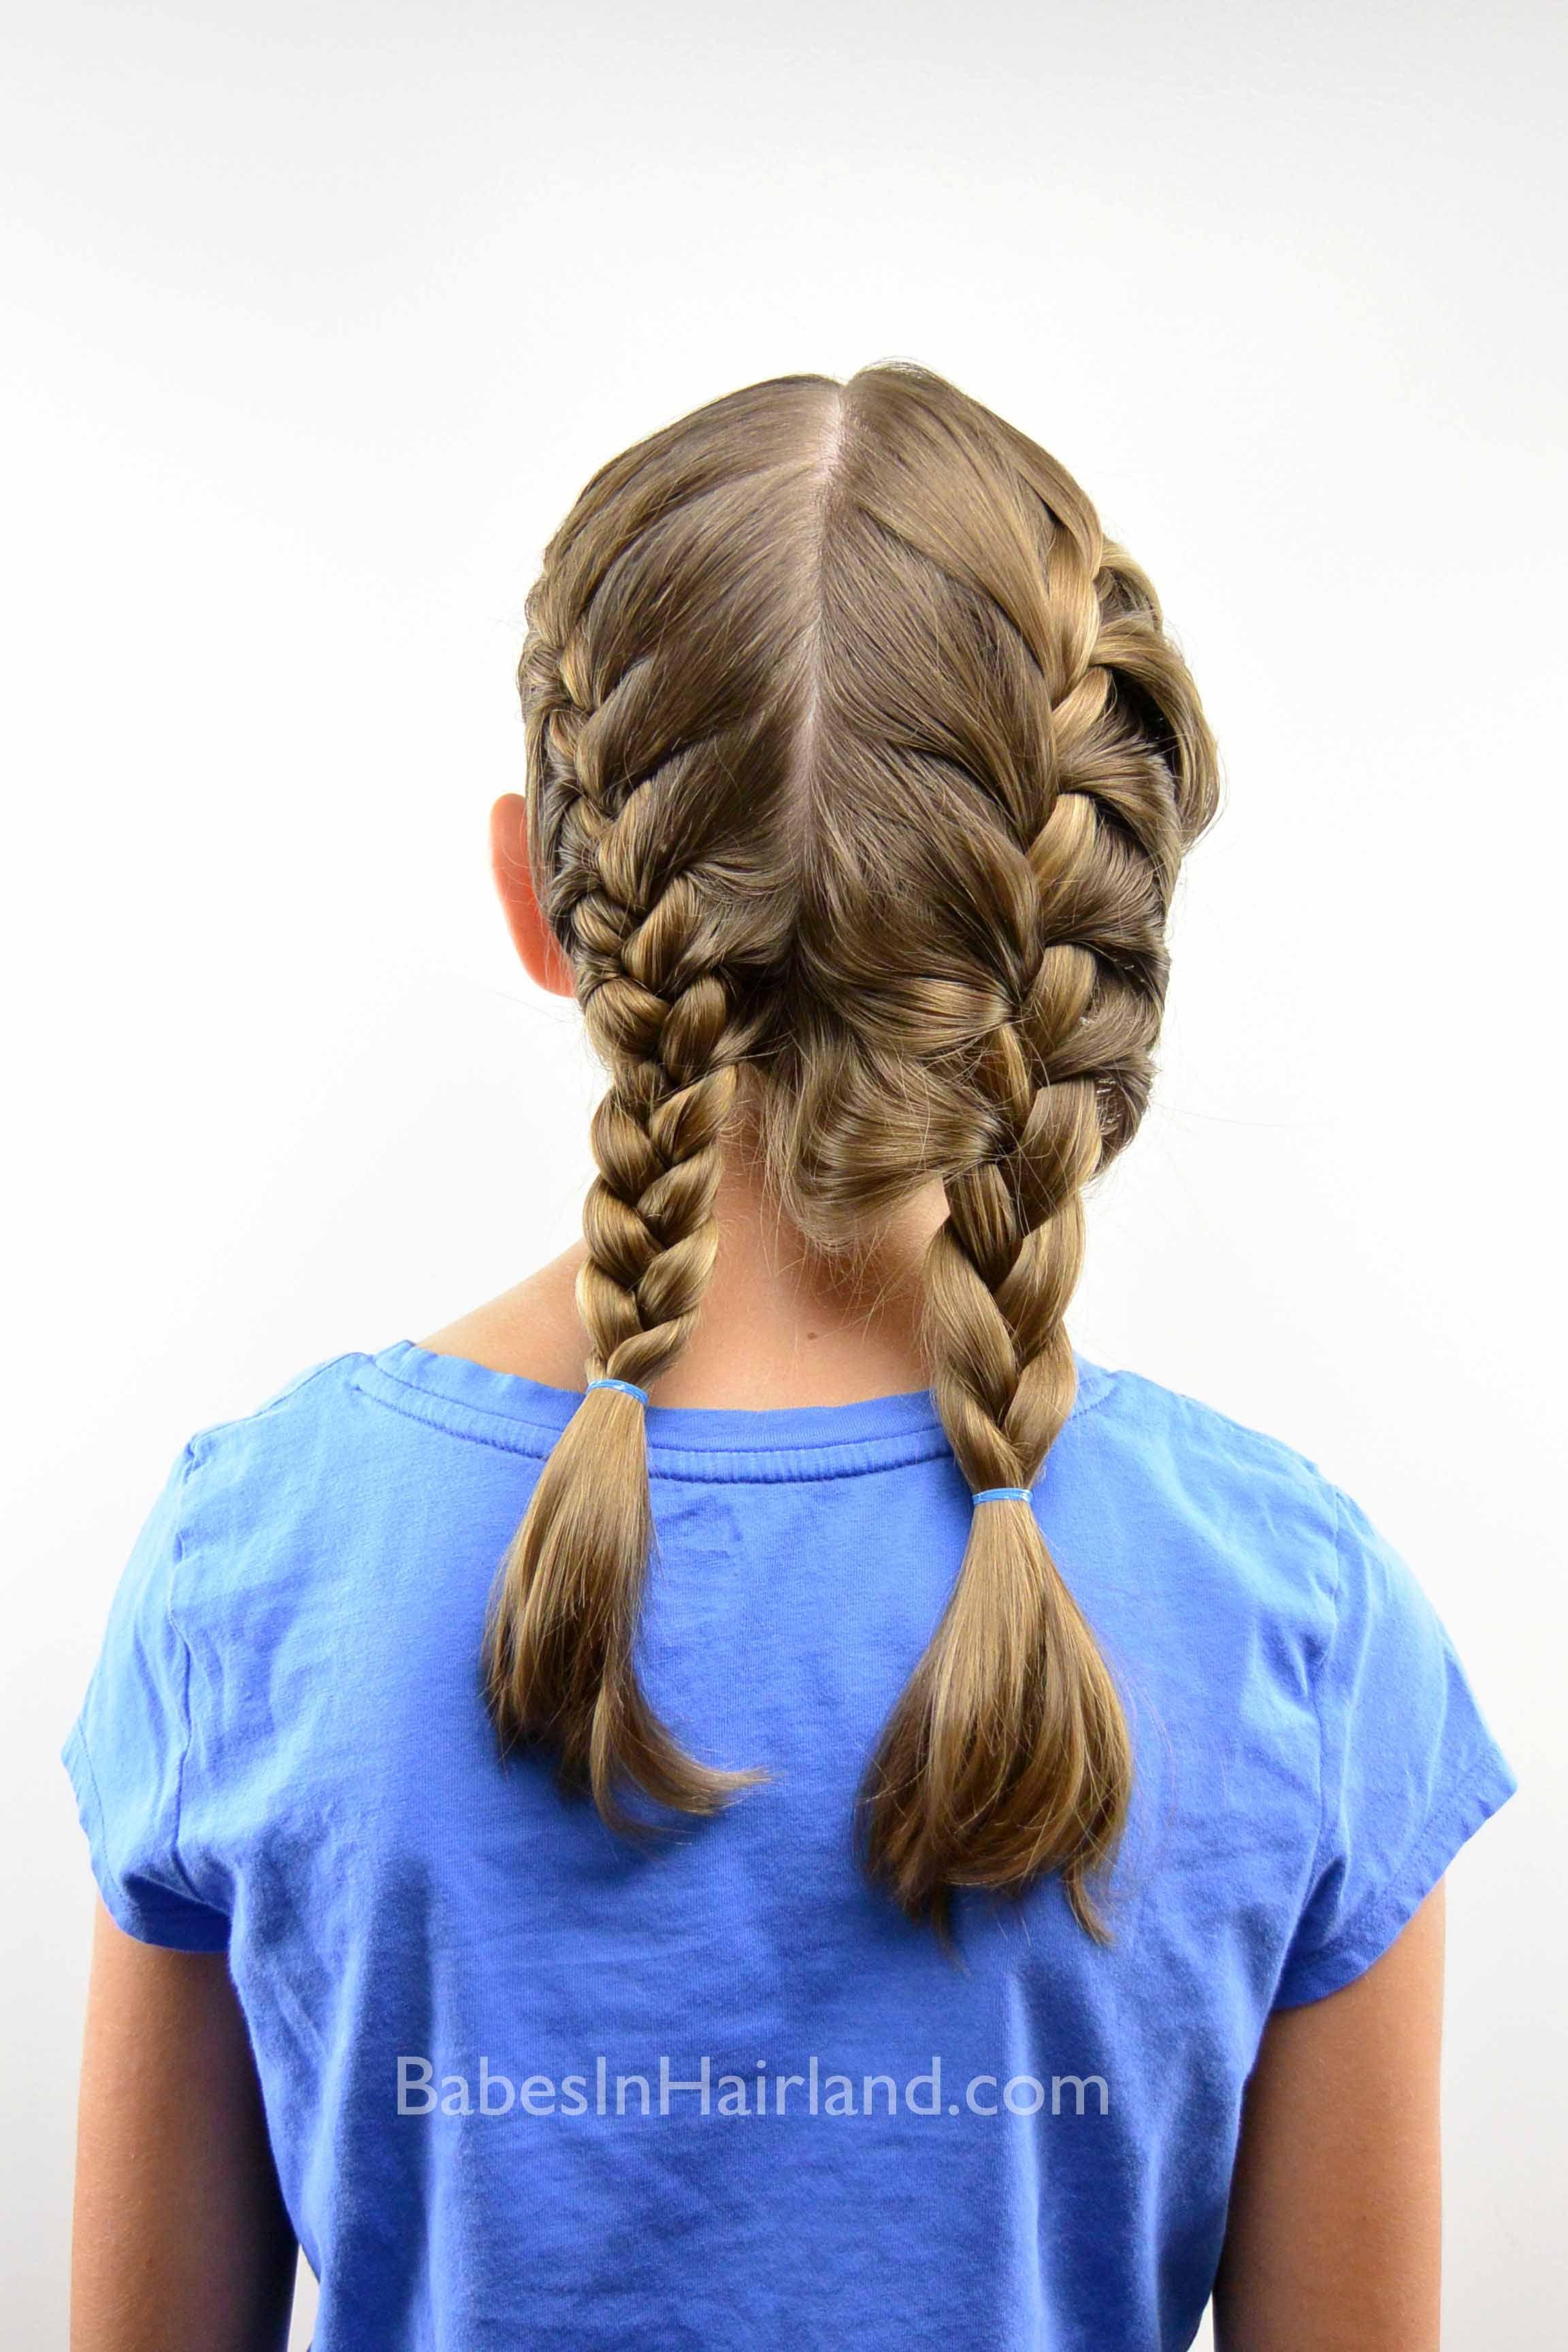 how to make a nice braid